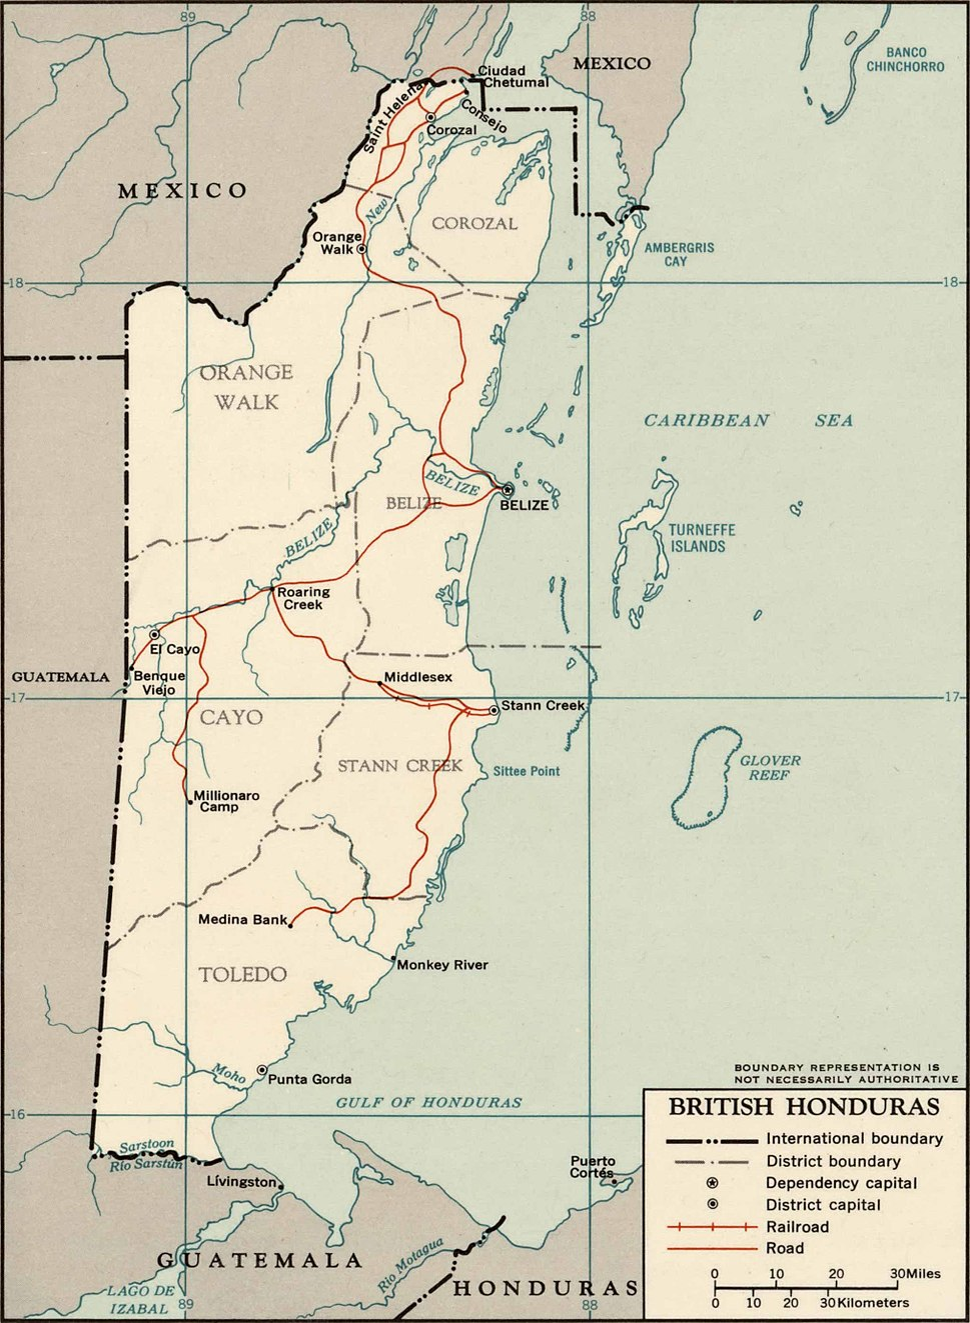 BritishHonduras-1965